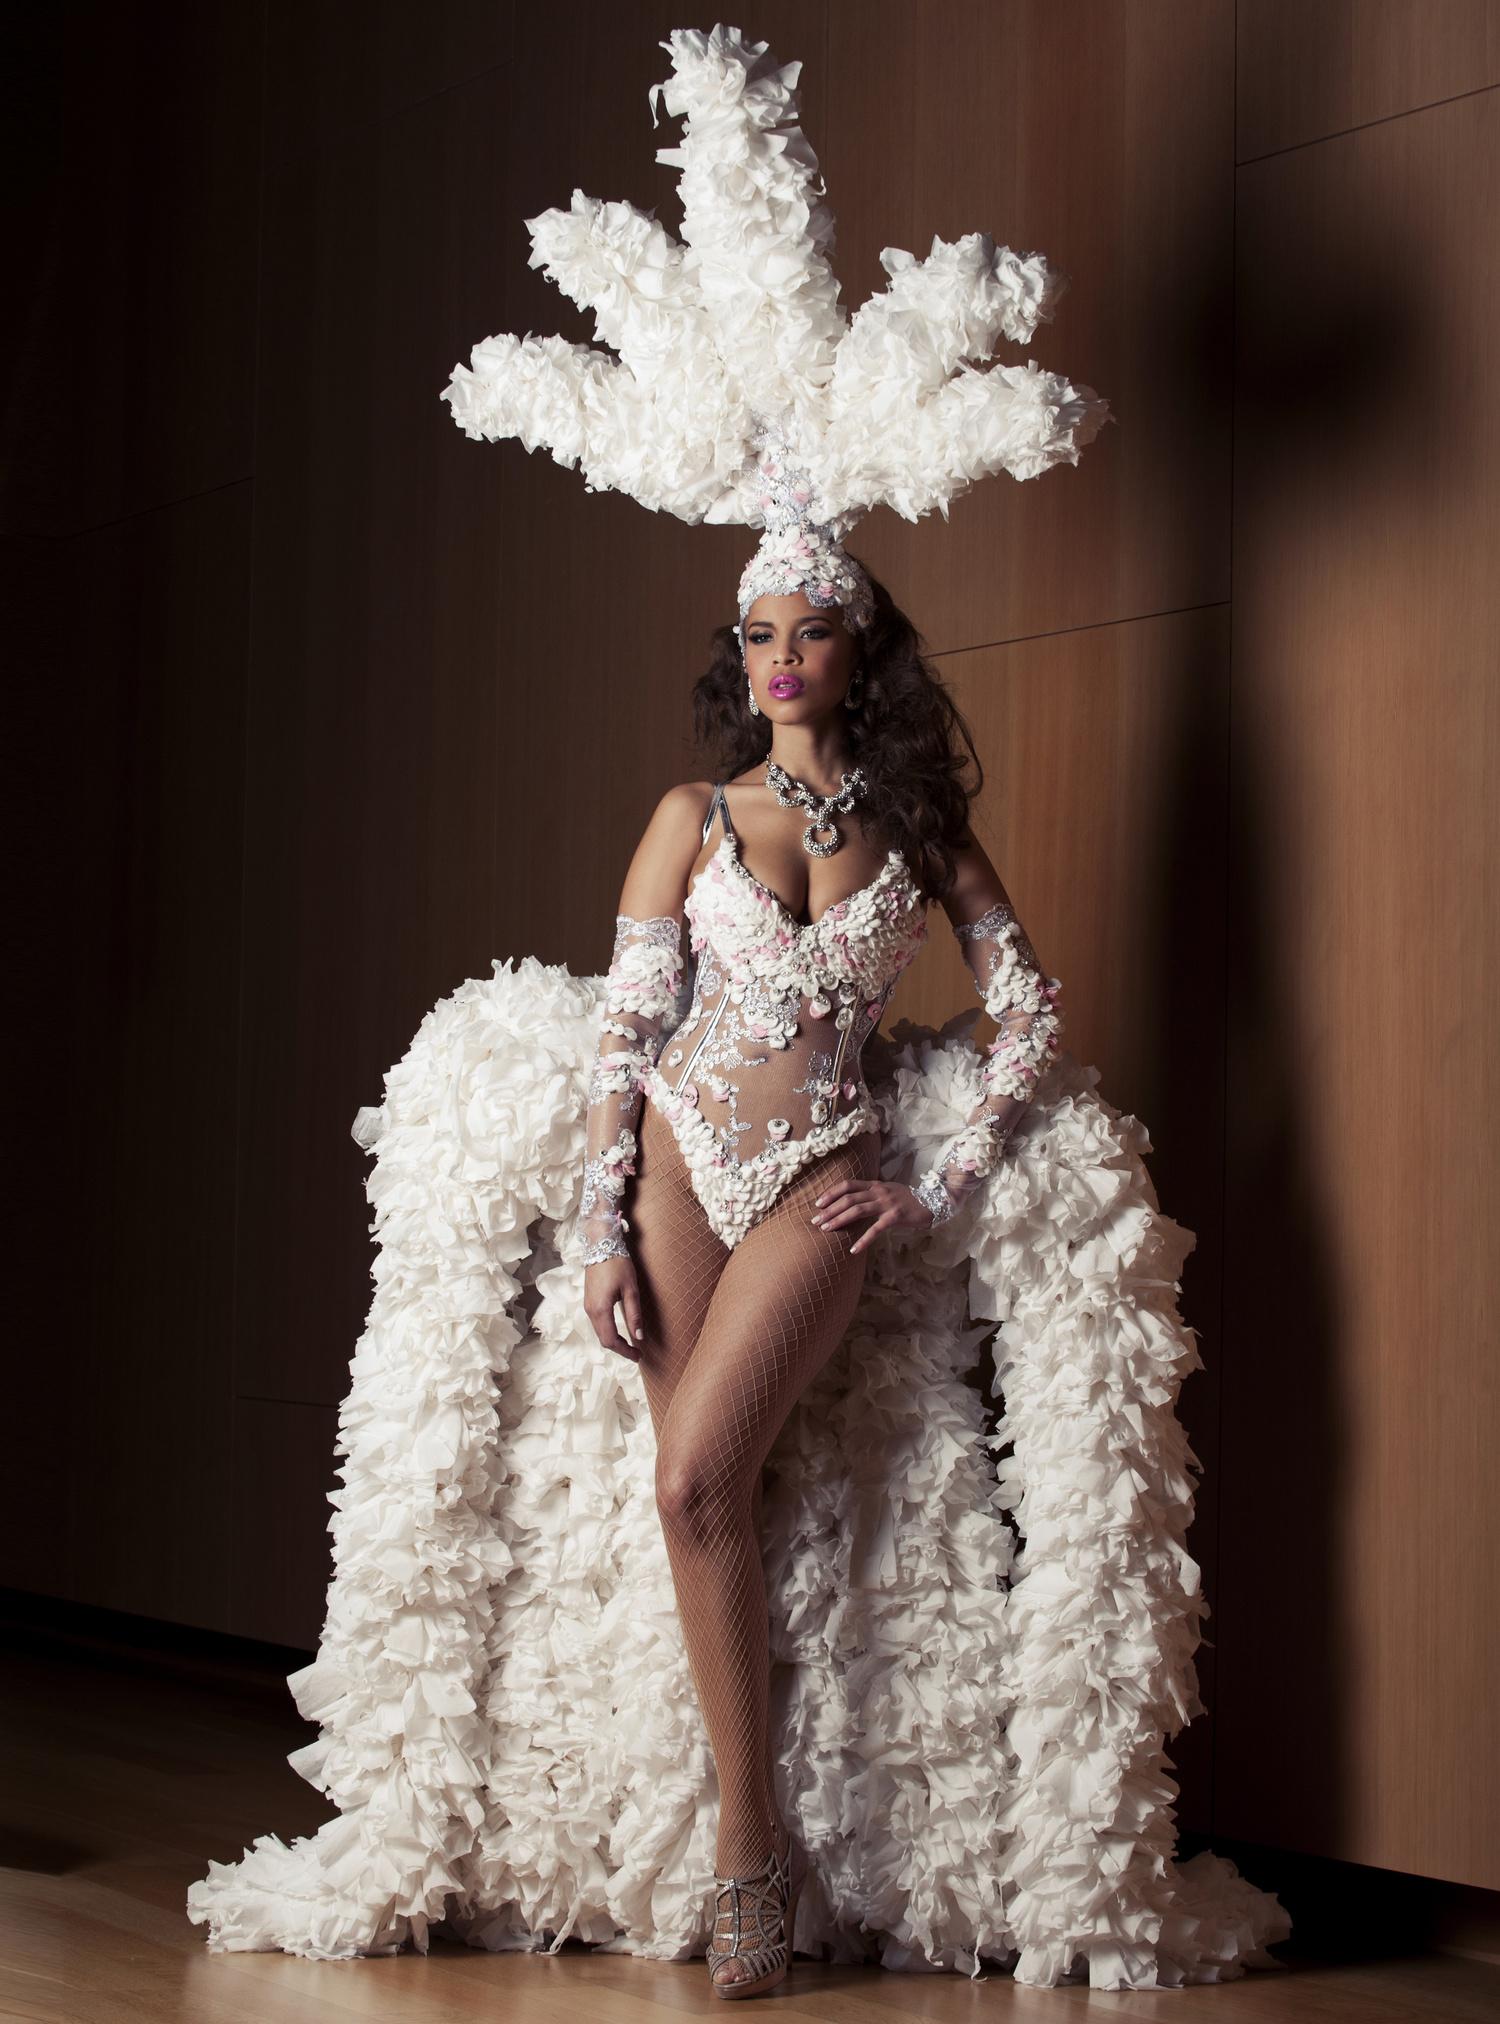 White-Cashmere-Collection-2013-Rod-Philpott-Photographer-Caitlin-Cronenberg.jpg